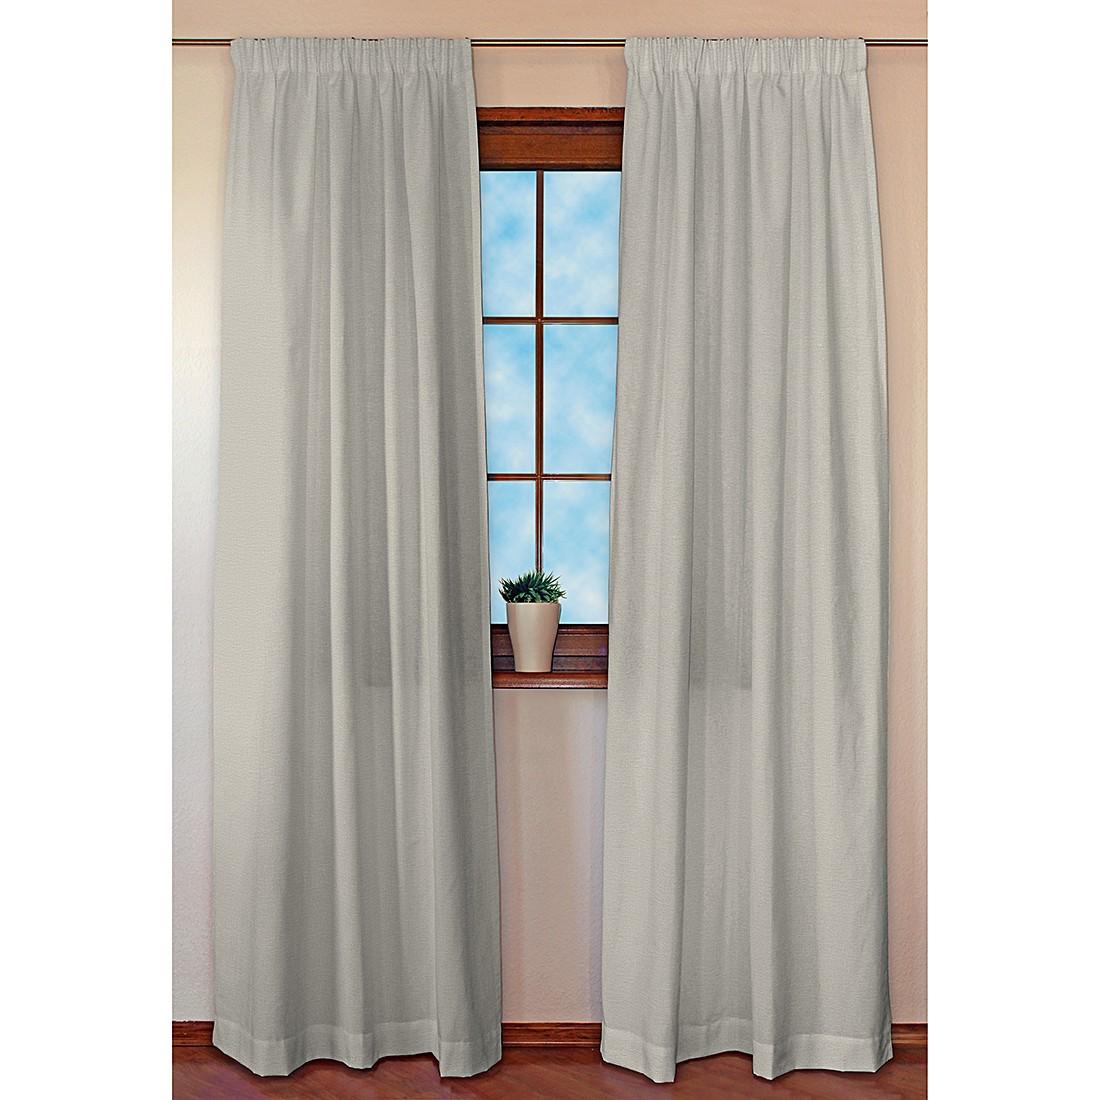 dekoria vorhang linen kr uselband grau gardine dekoschal verdunklungsvorhang ebay. Black Bedroom Furniture Sets. Home Design Ideas